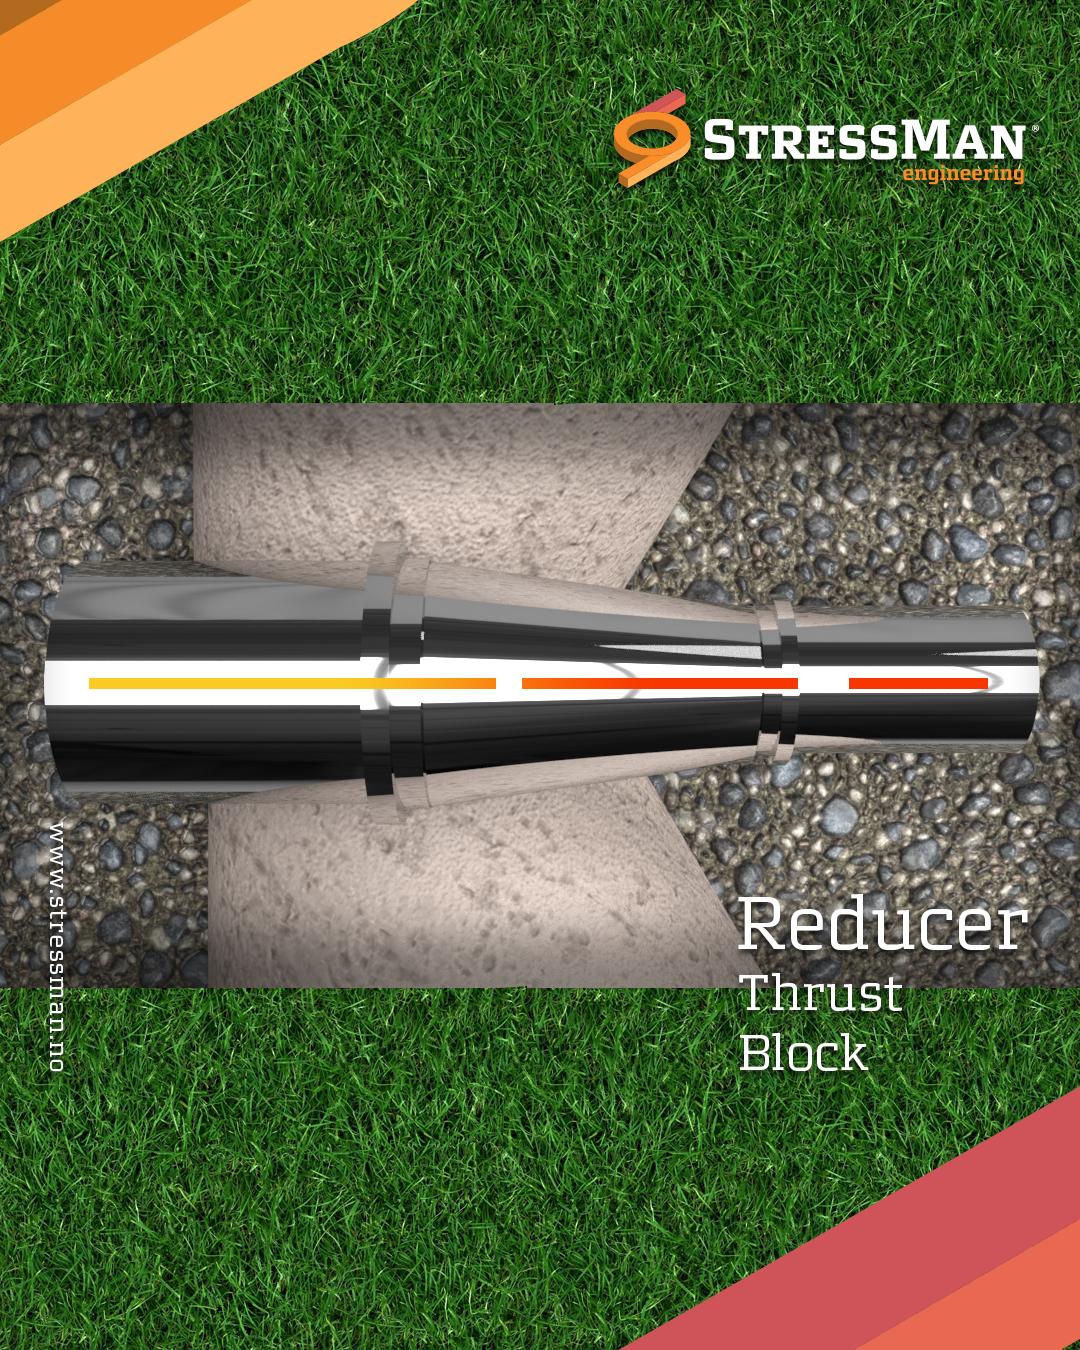 reducer thrust block Stressman Engineering